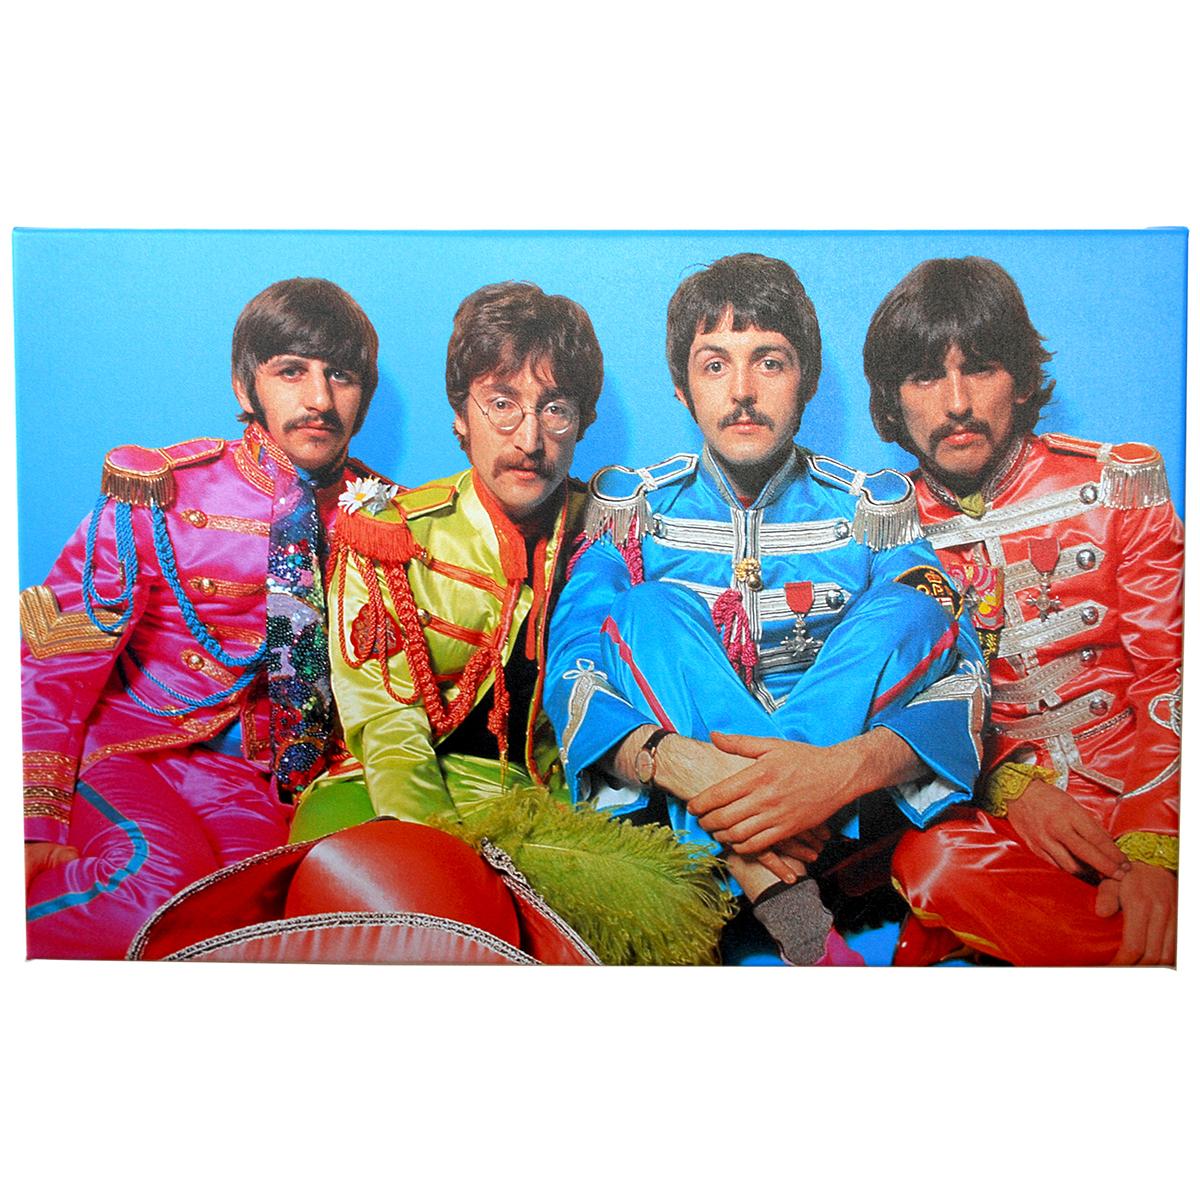 Beatles Sgt. Pepper Print